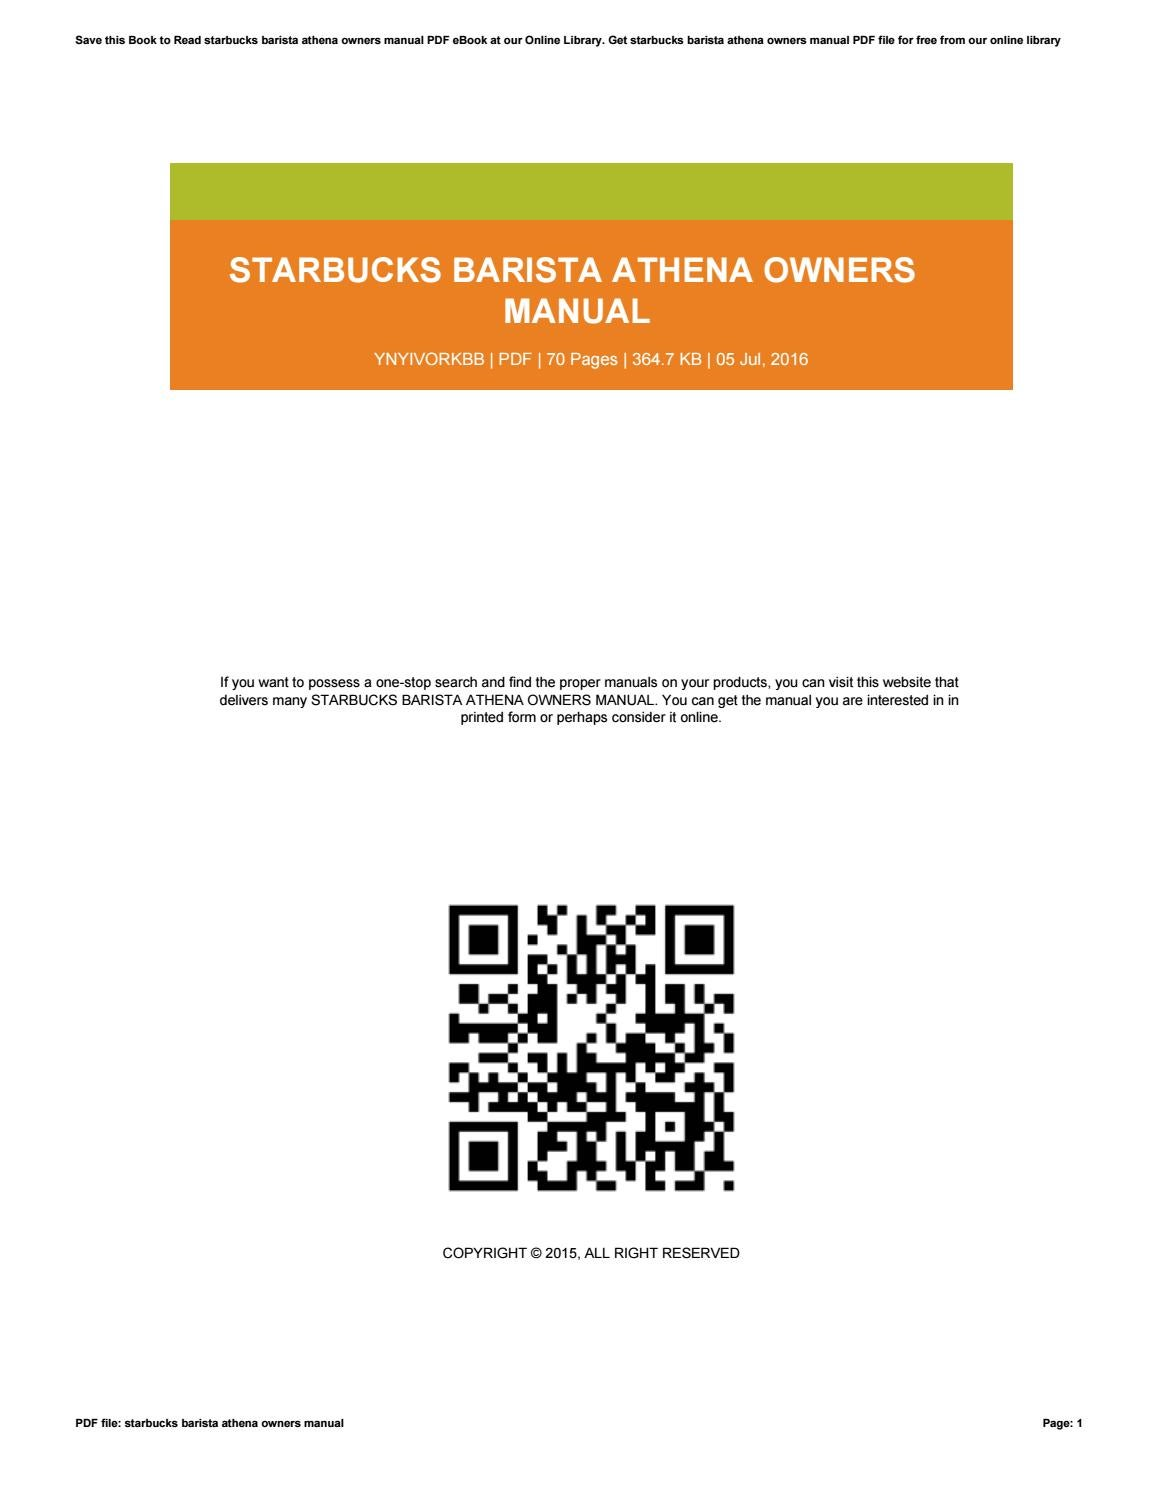 Starbucks barista athena owners manual by BradleyHinton2834 - issuu